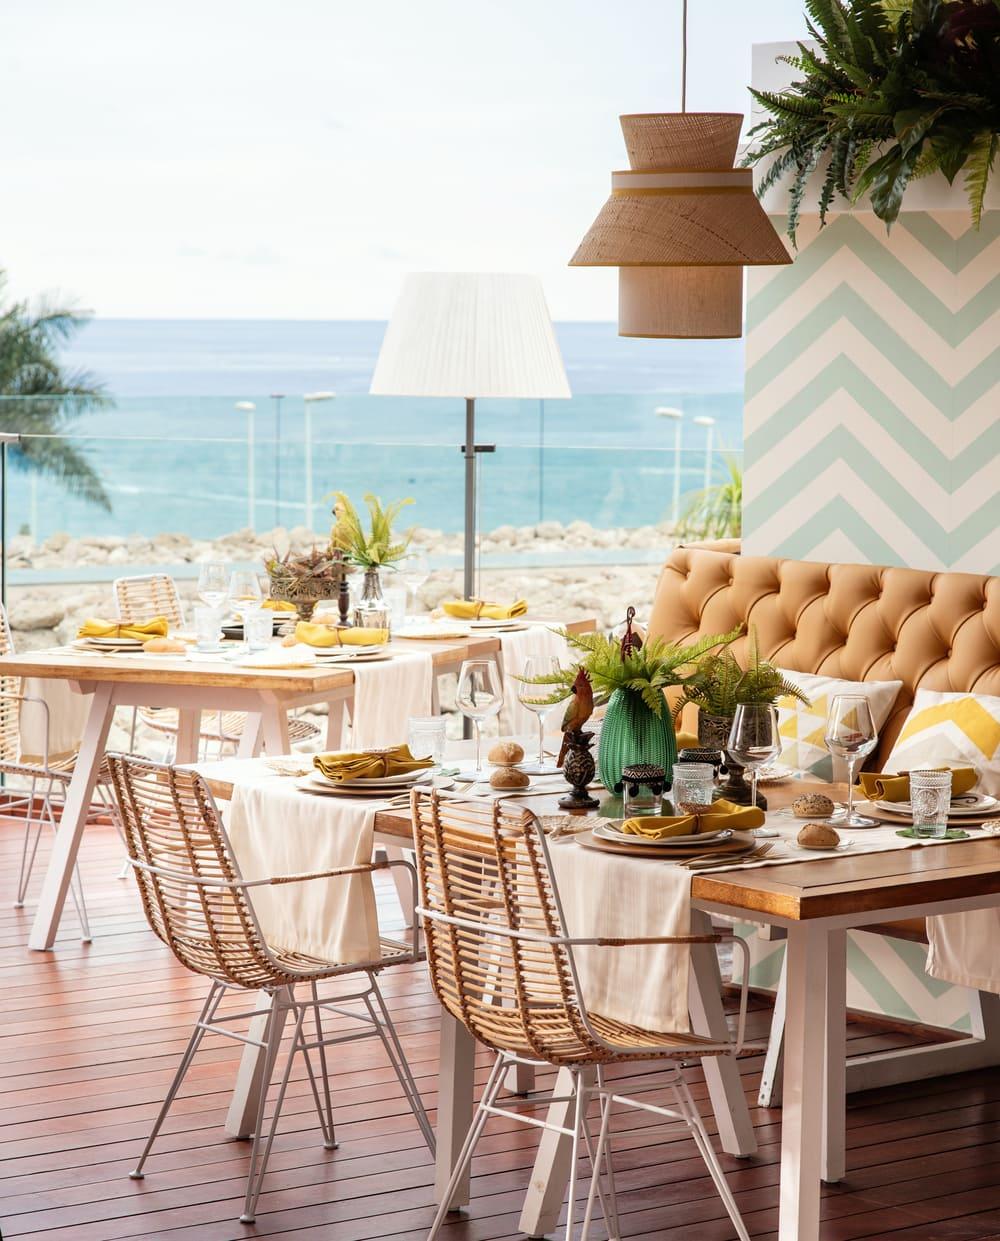 bb-restaurant-costa-adeje-tenerife (6)